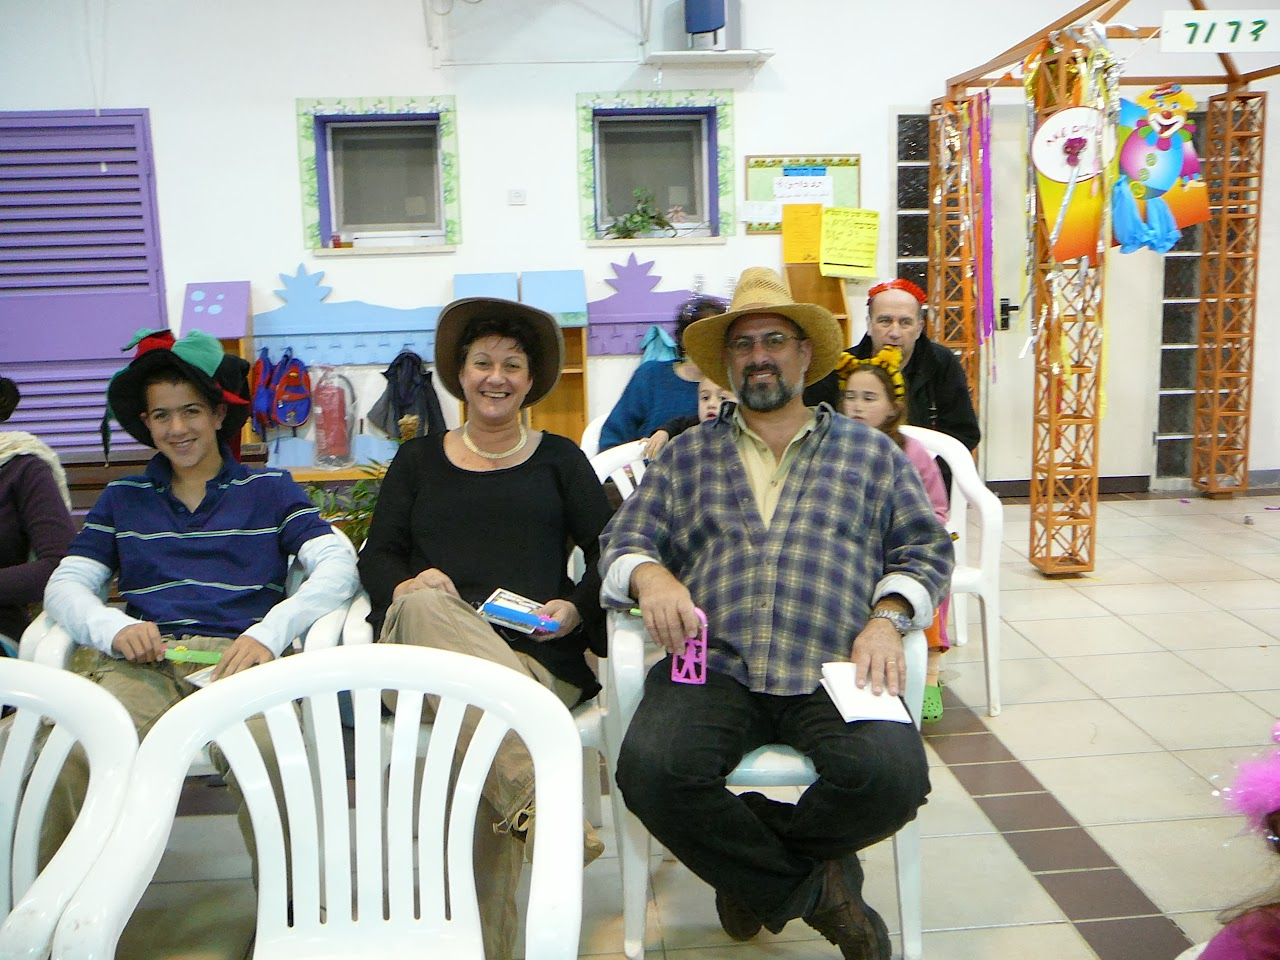 Purim 2007  - 2007-03-03 12.38.34.jpg